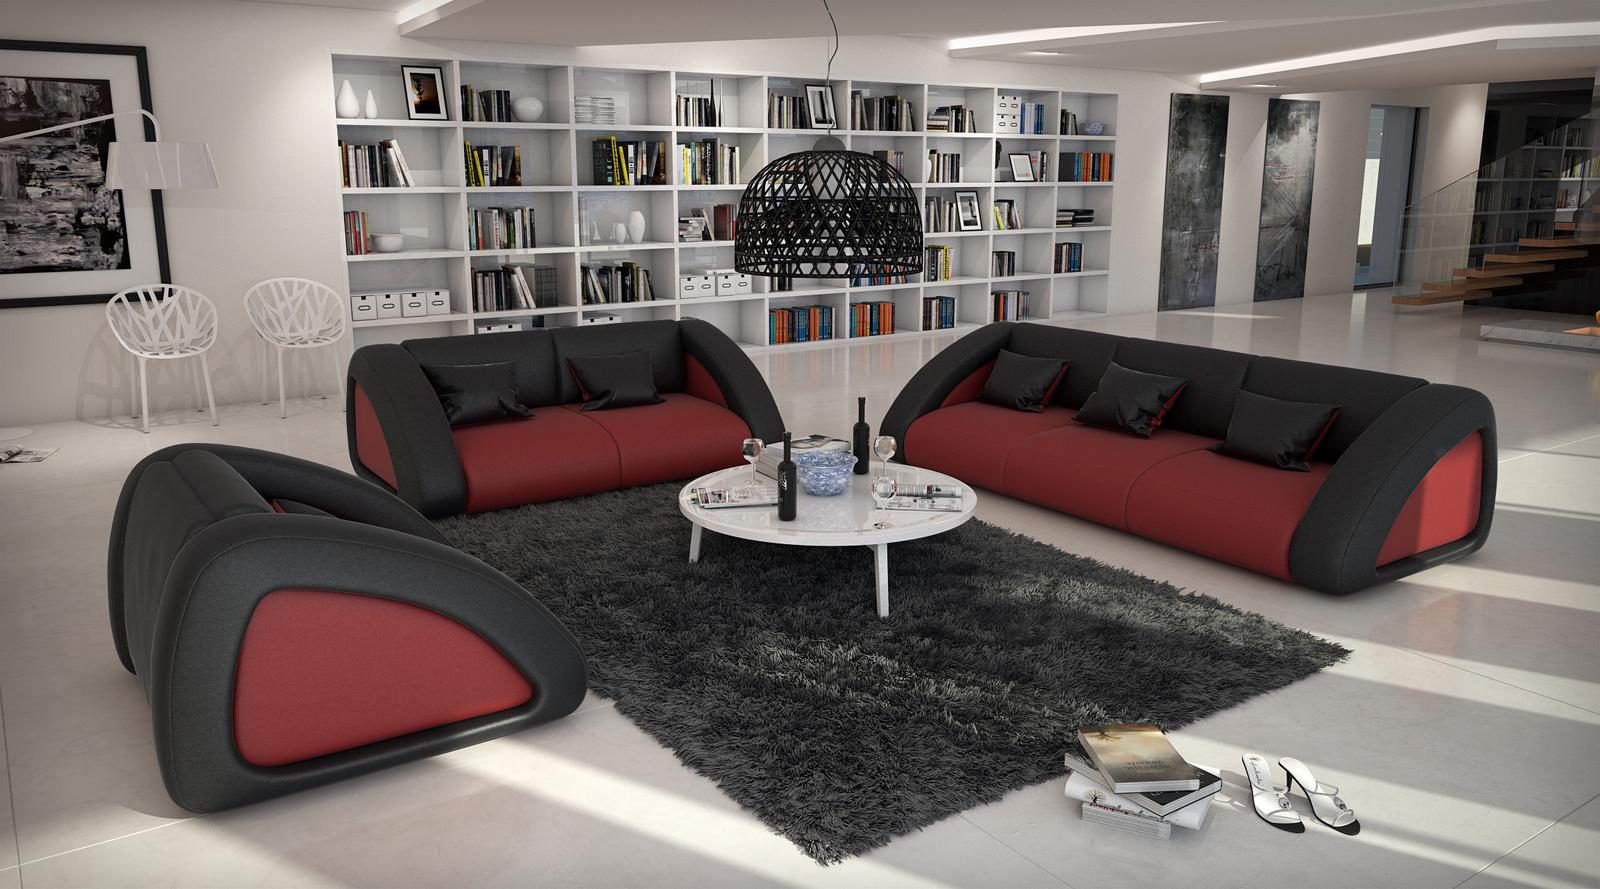 Sam sofa garnitur farbauswahl ciao combi 3 2 1 bestellware for Farbauswahl wohnung